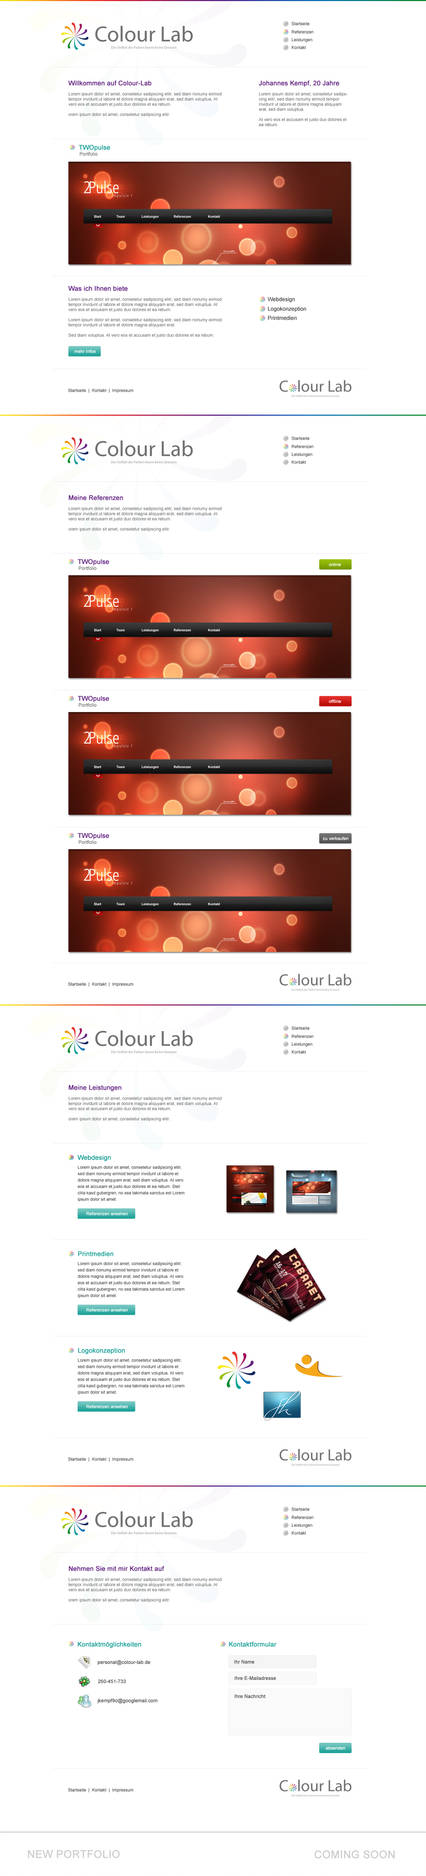 Colour Lab Version 2.0 by jk9o